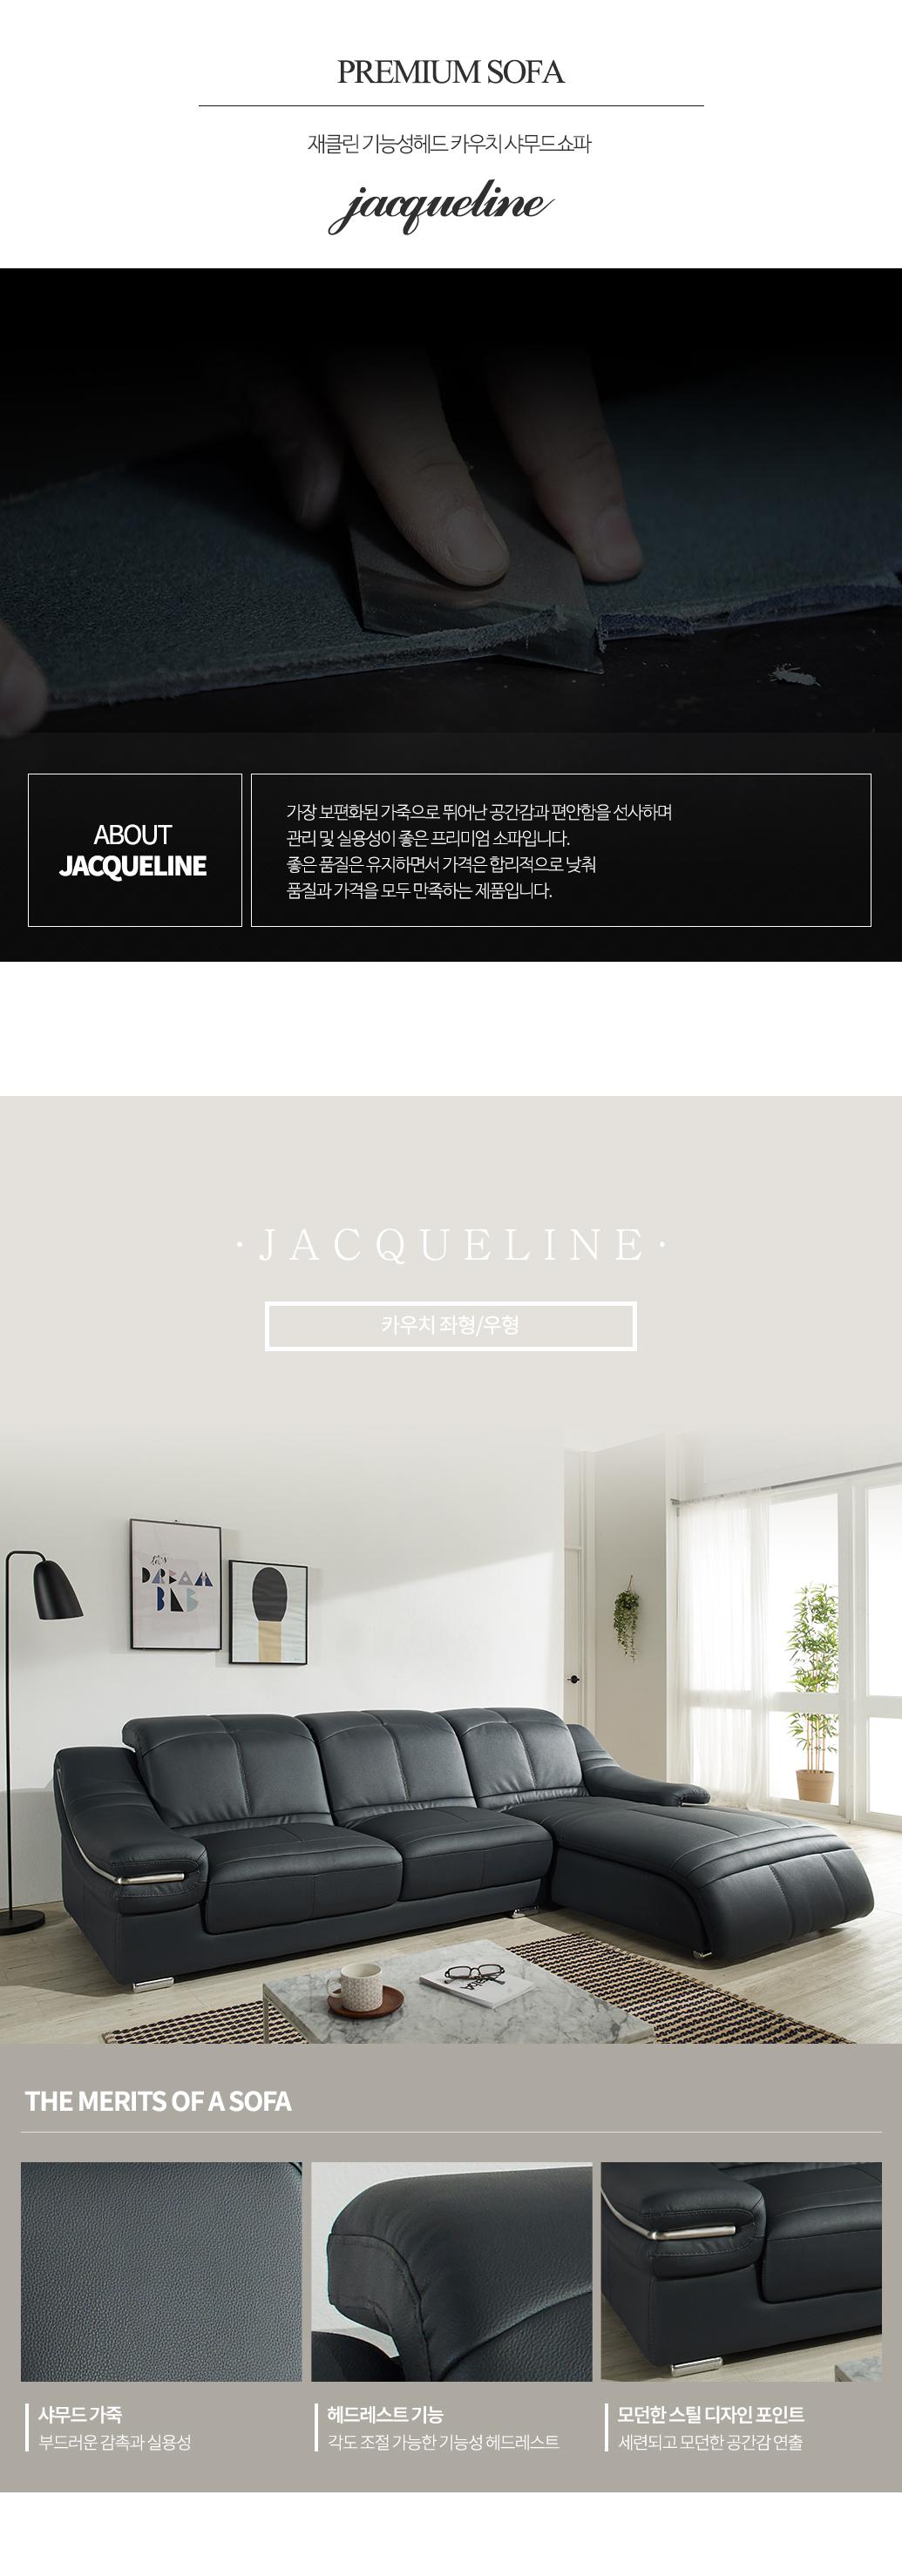 jacqueline01.jpg